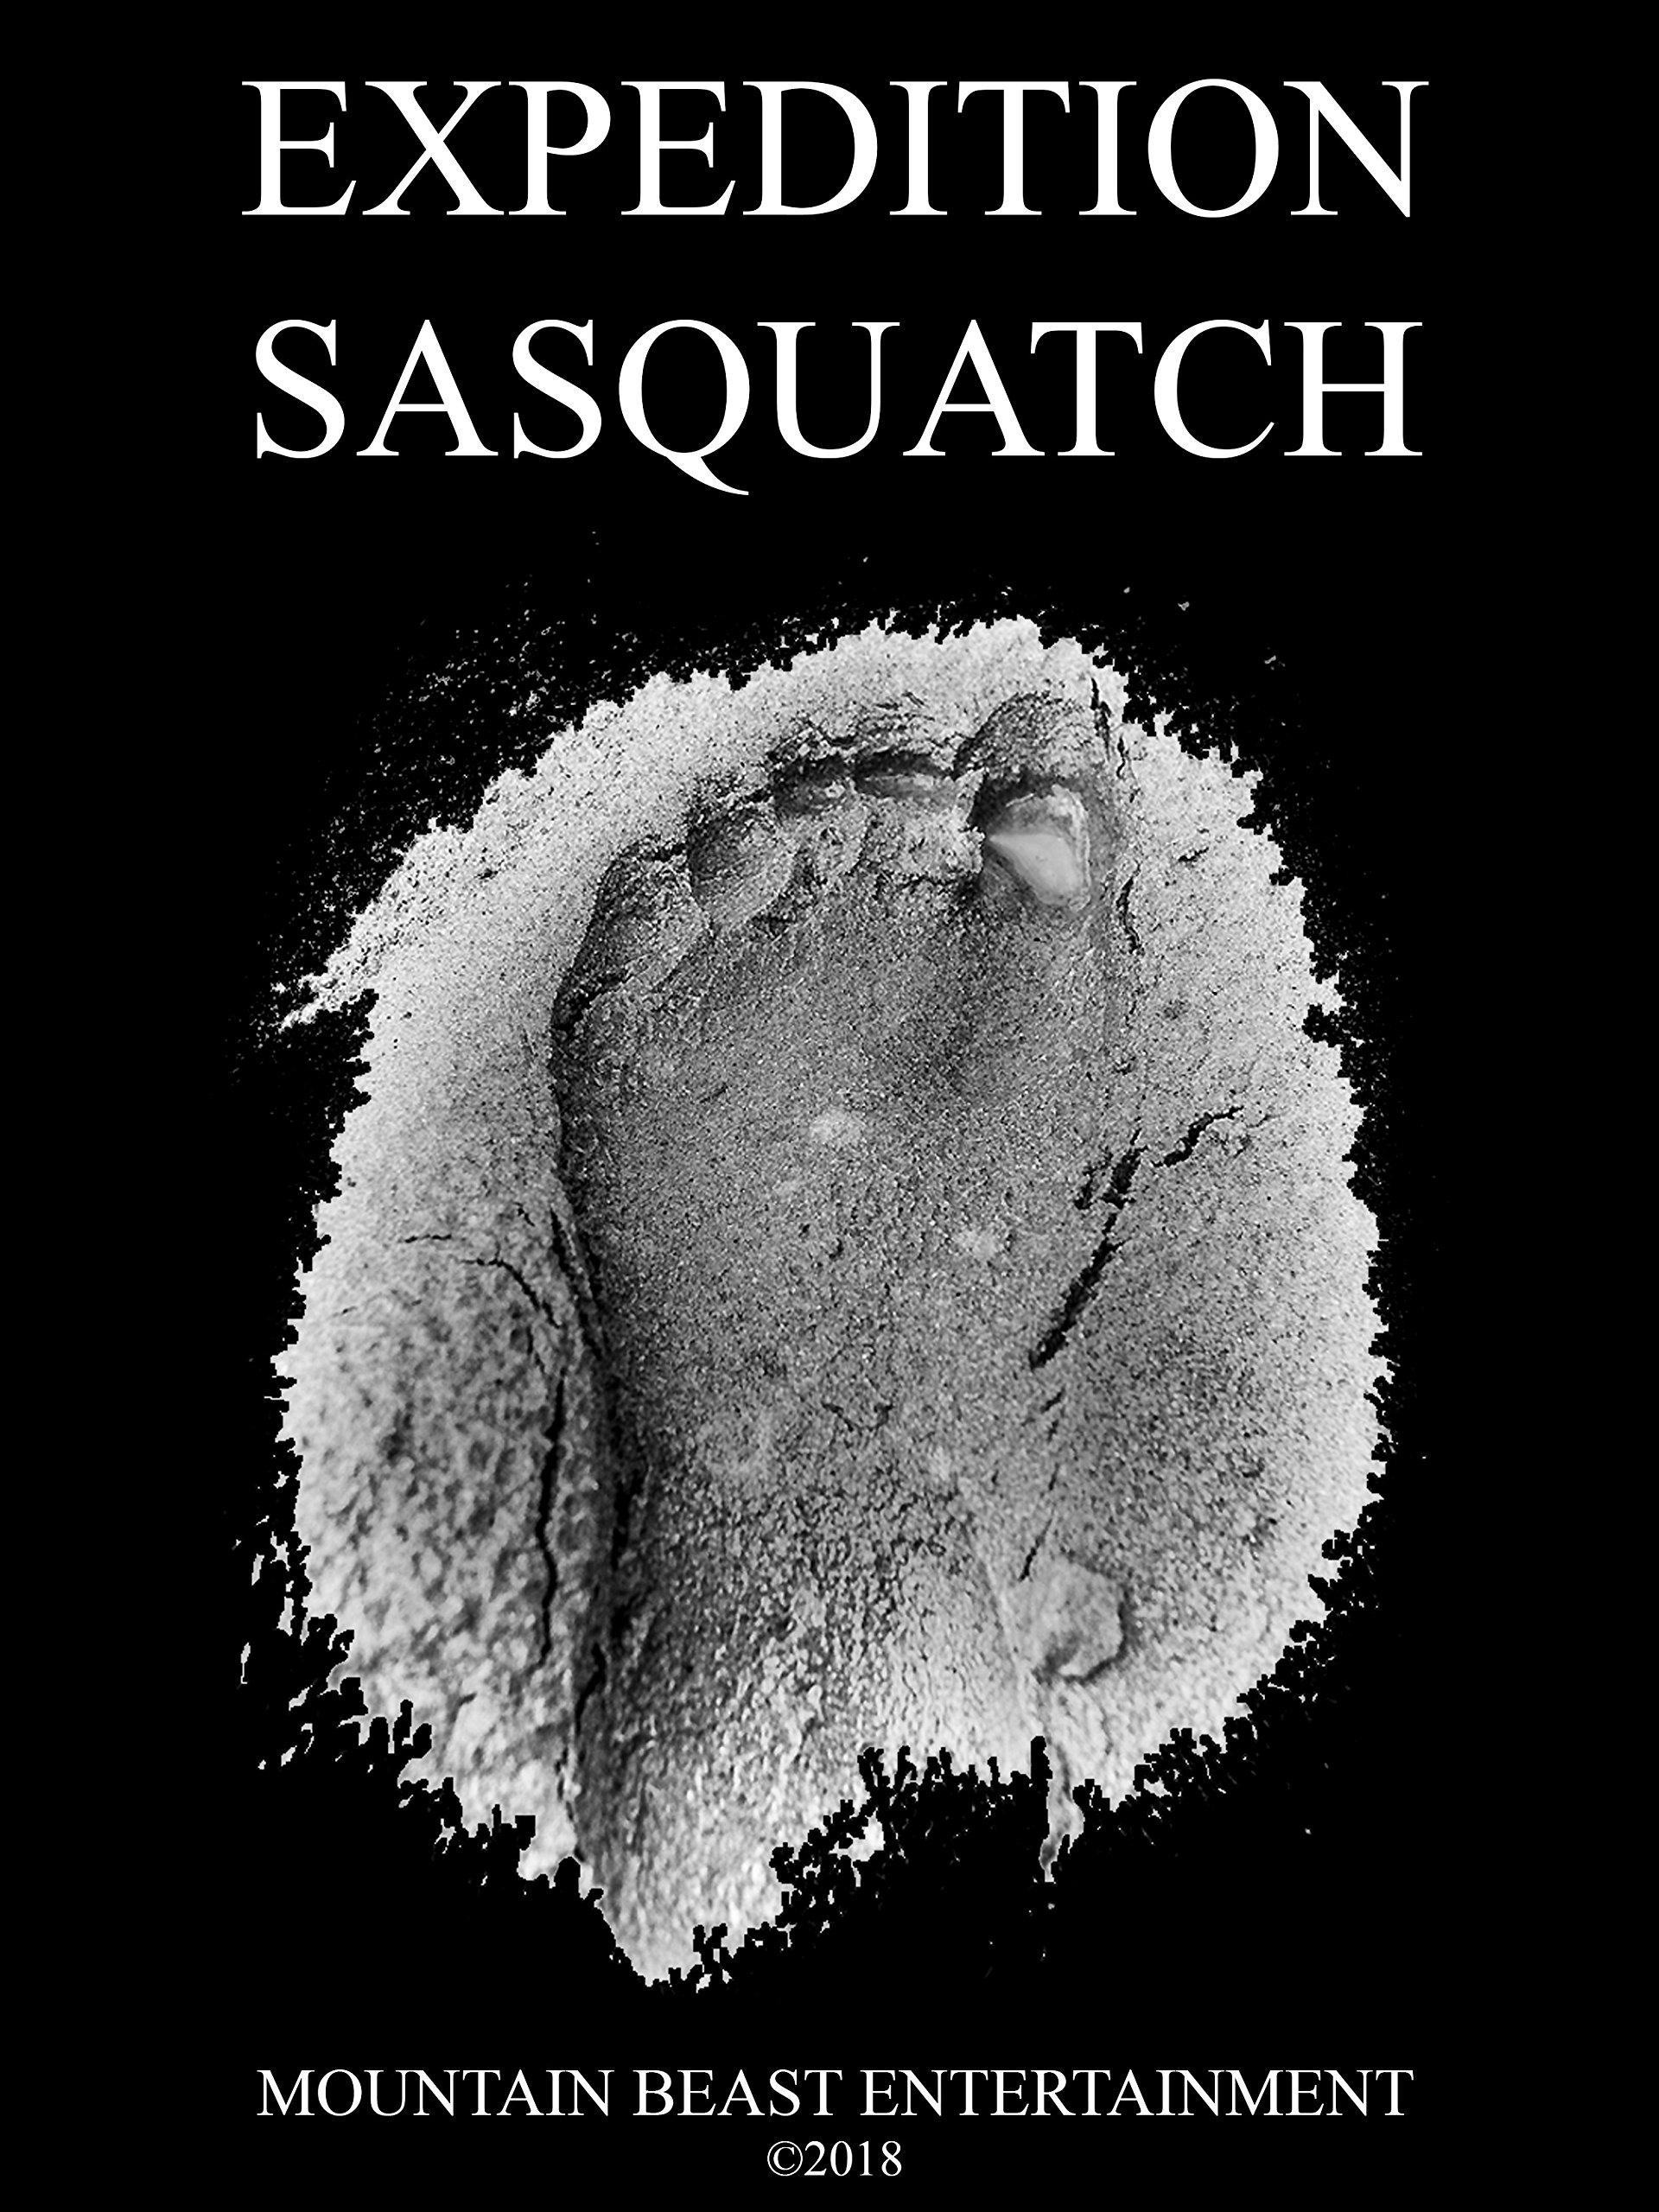 Expedition Sasquatch